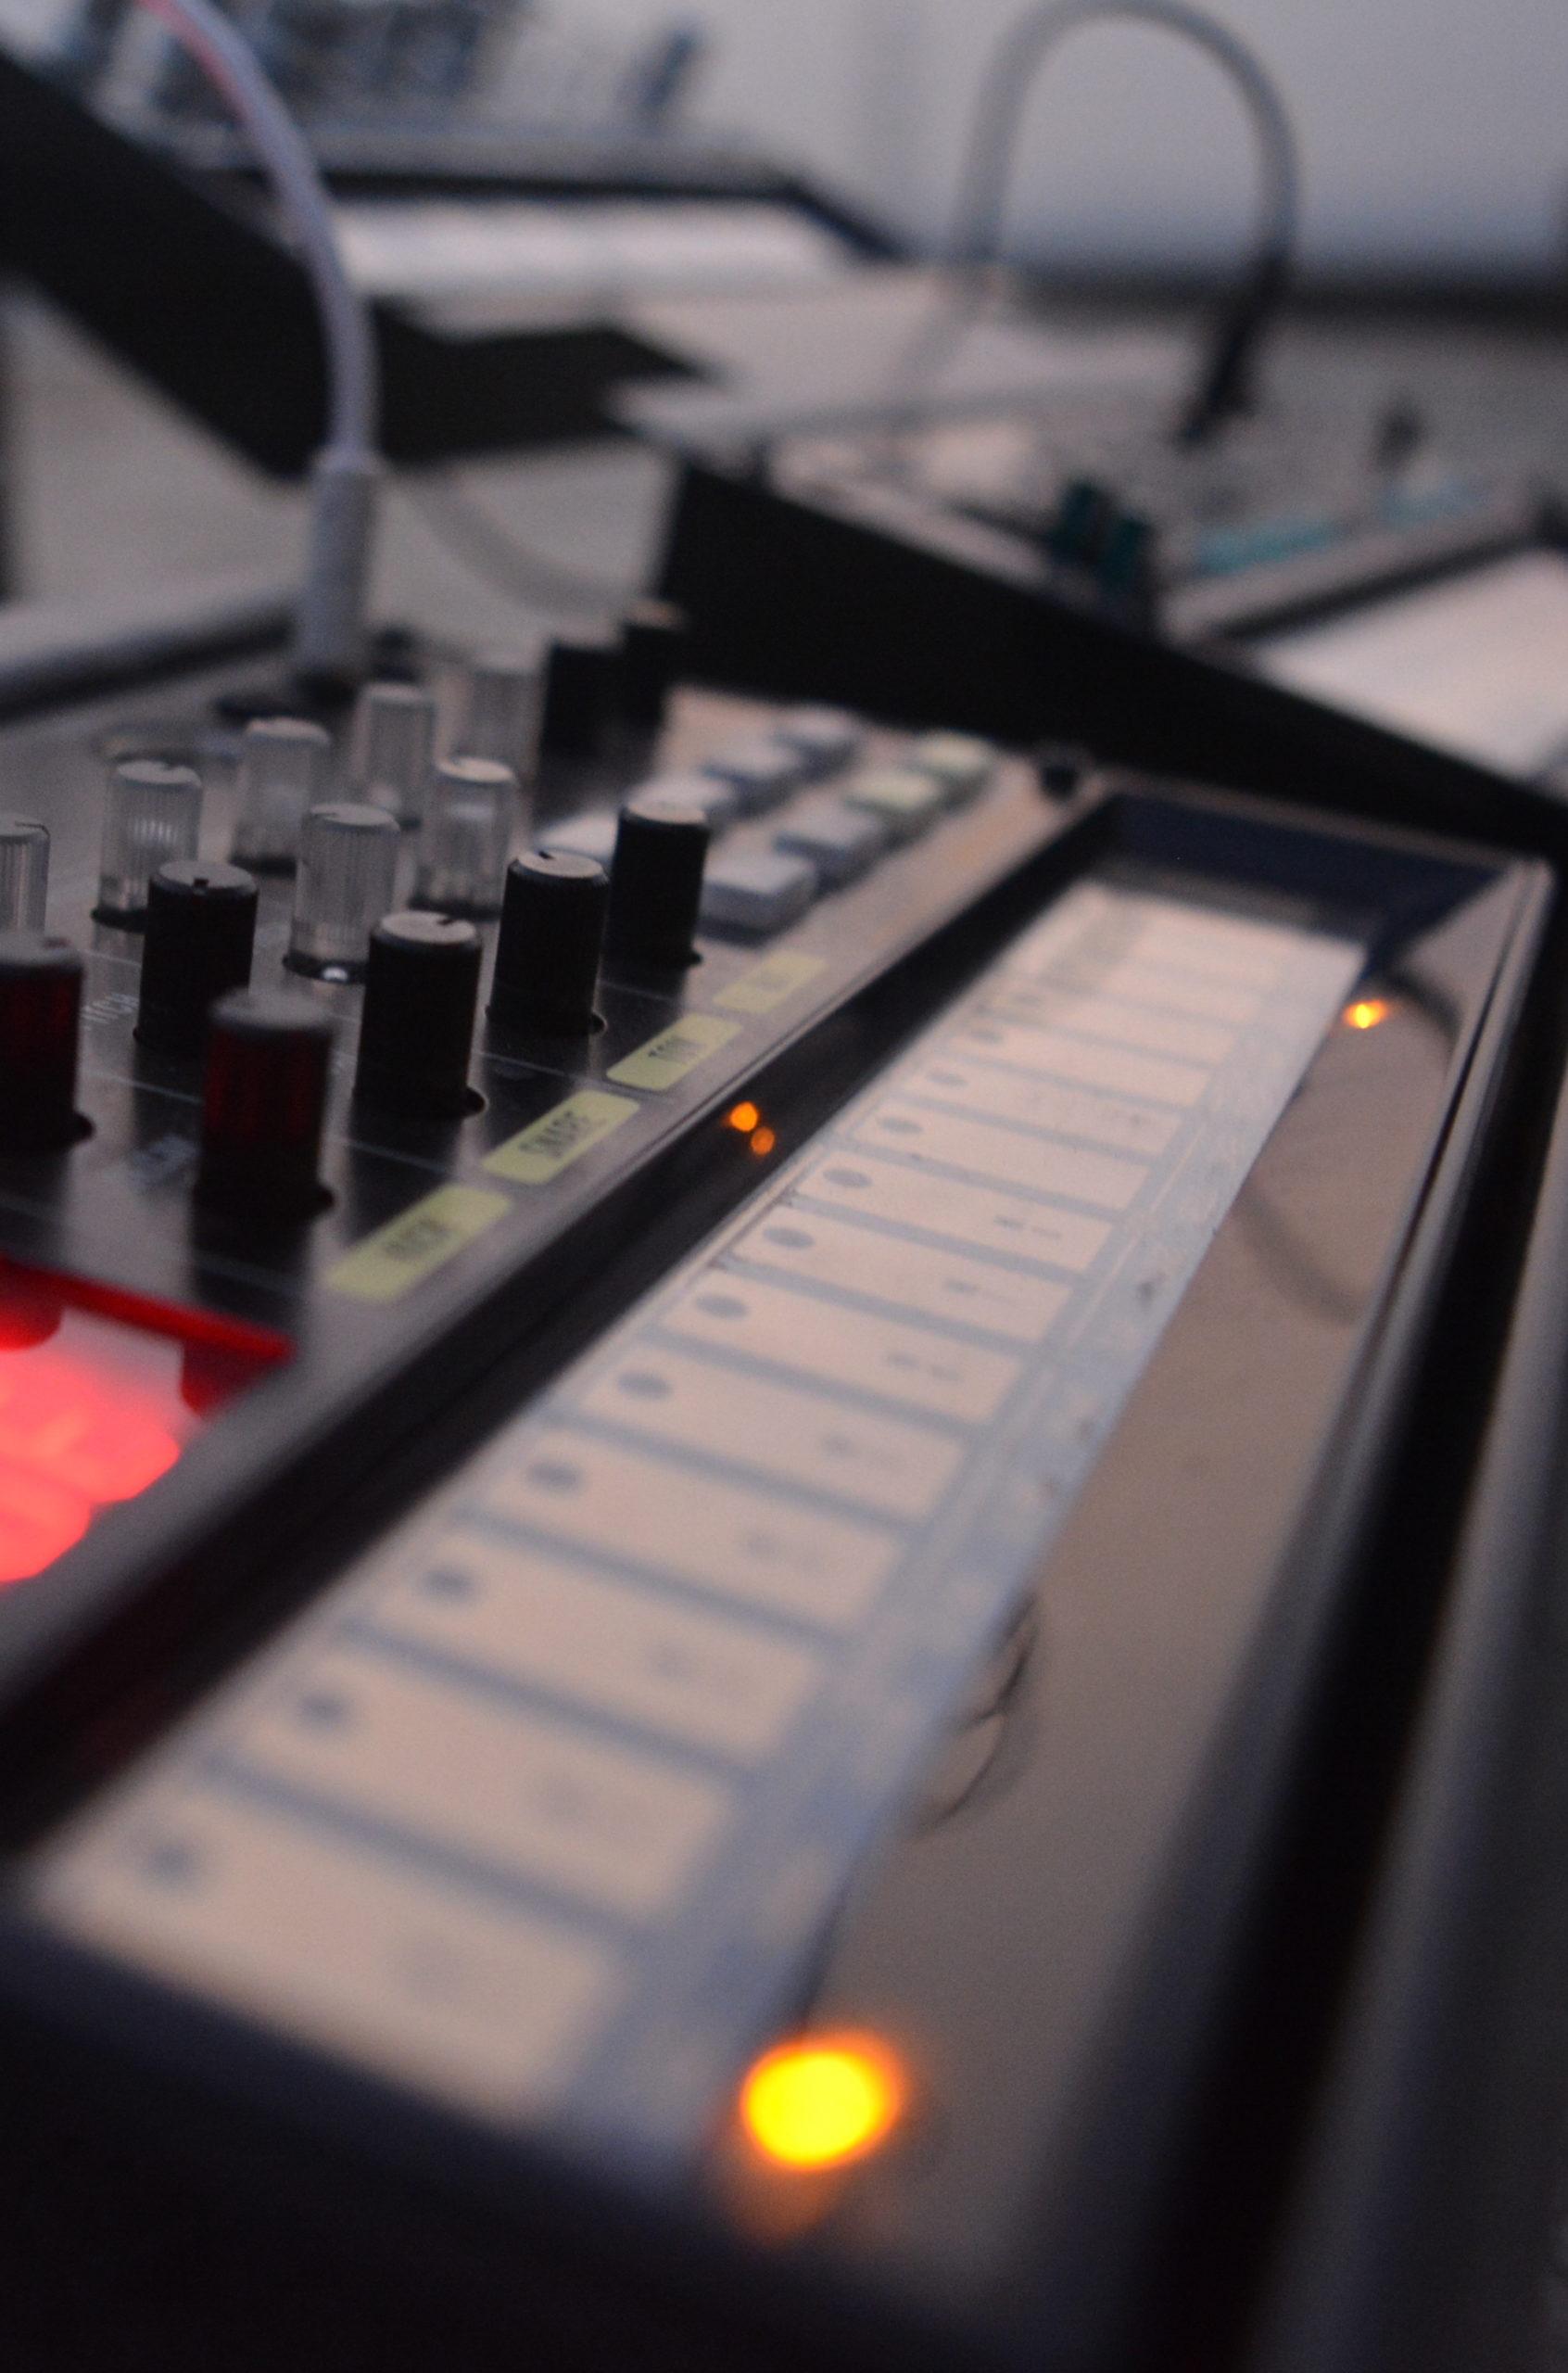 Music photo created by sid4rtproduction - www.freepik.com